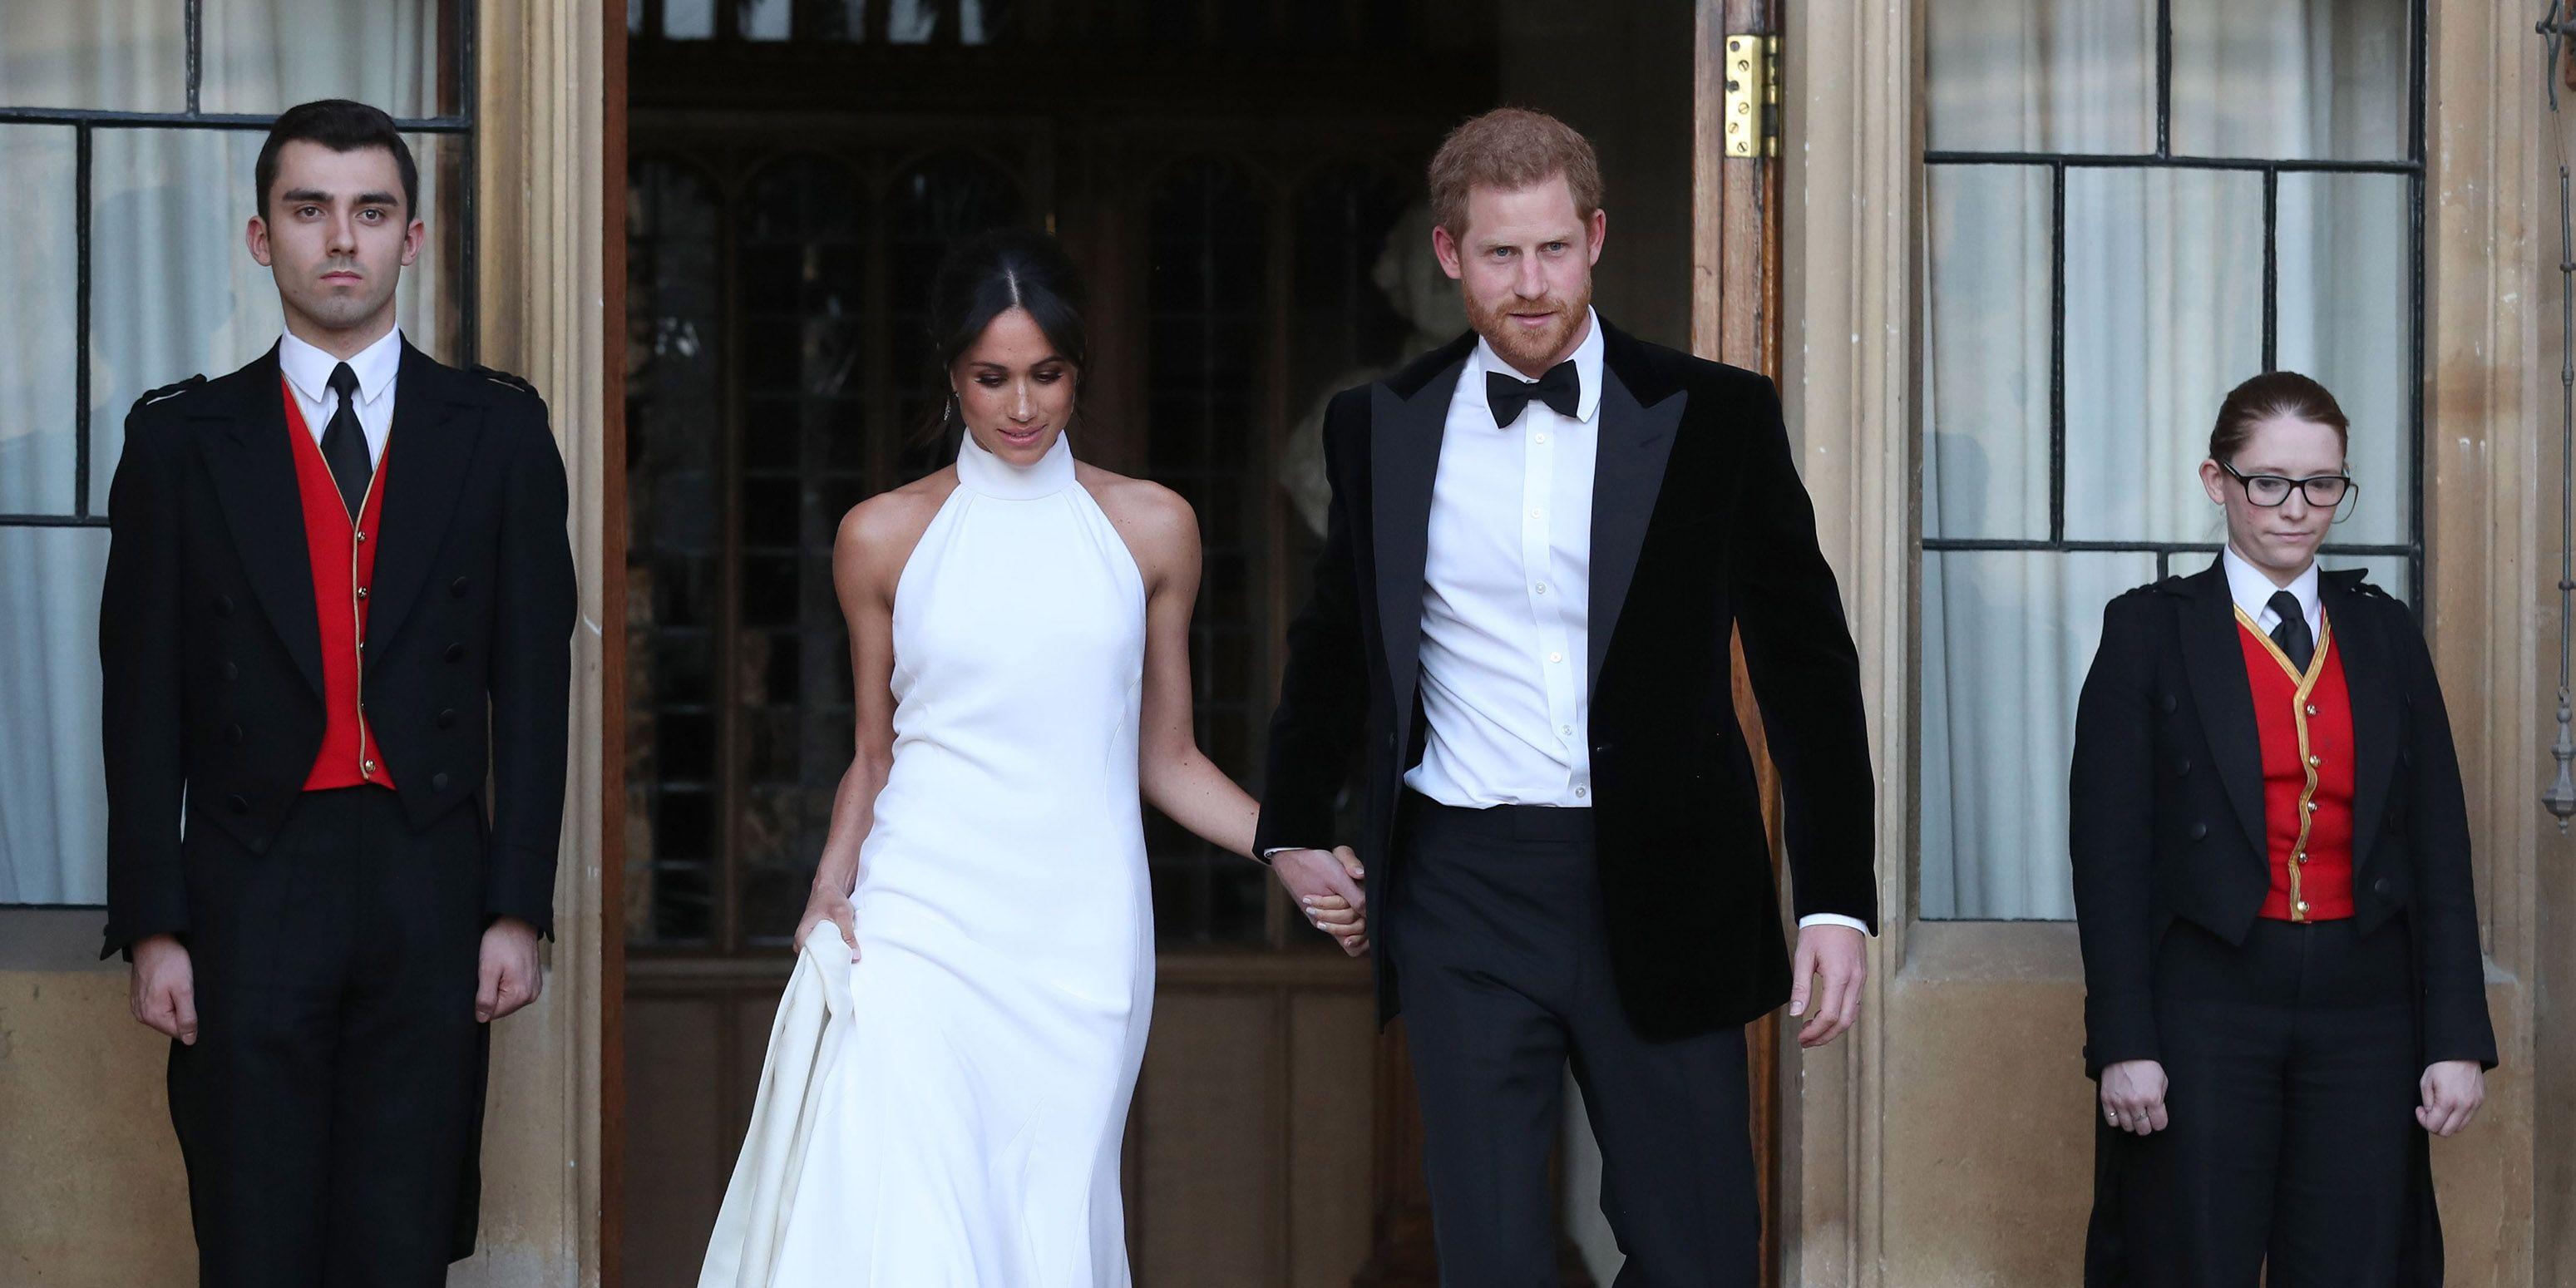 Meghan Markle Will Wear Two Wedding Dresses At Royal Wedding